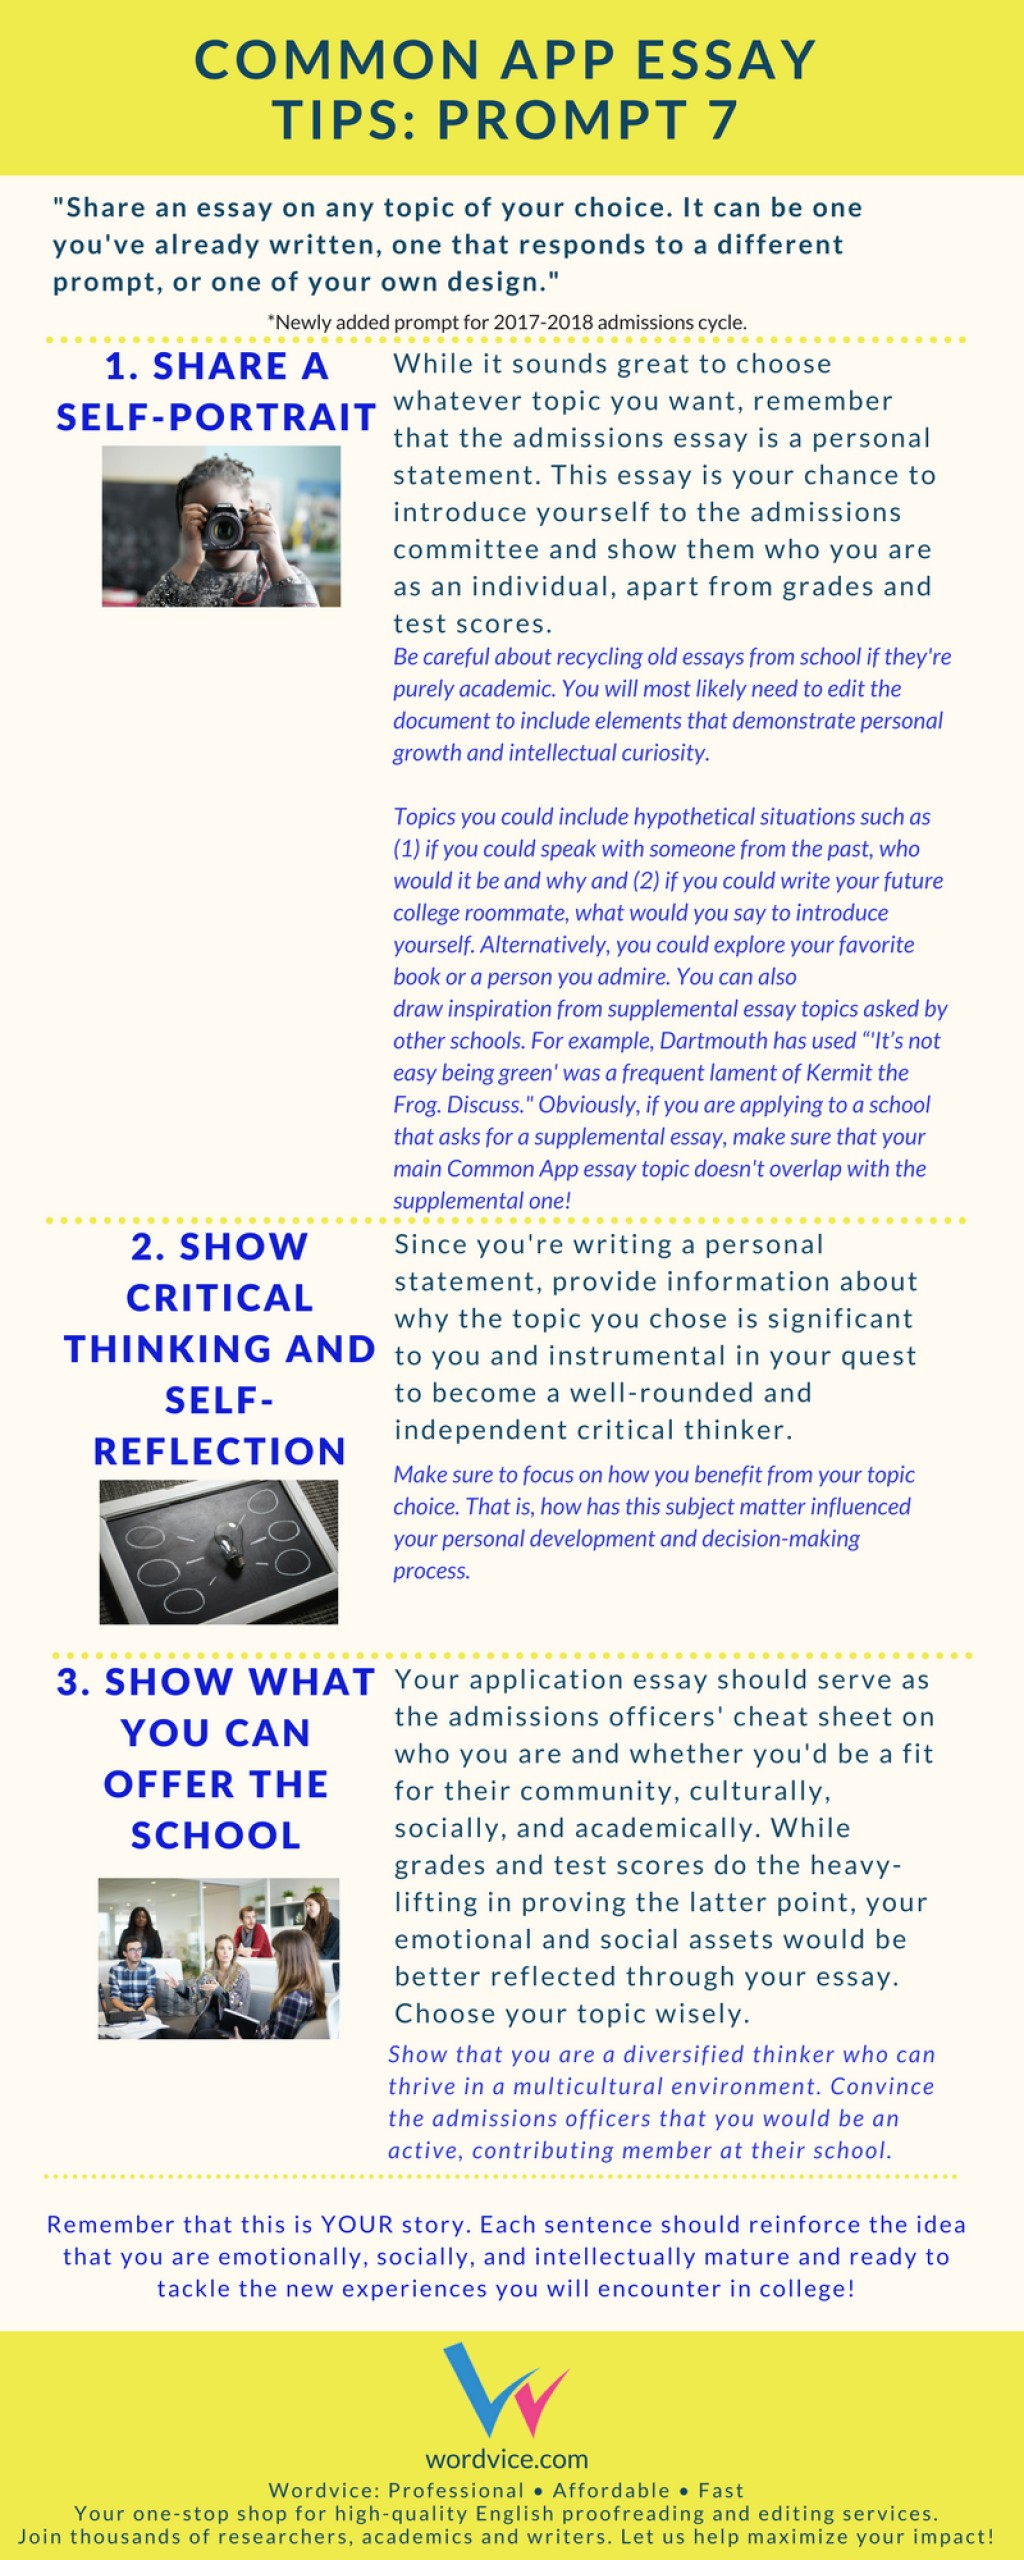 008 Common App Brainstormprompt Essay Example Unusual Prompt Examples 6 1 Sample Large